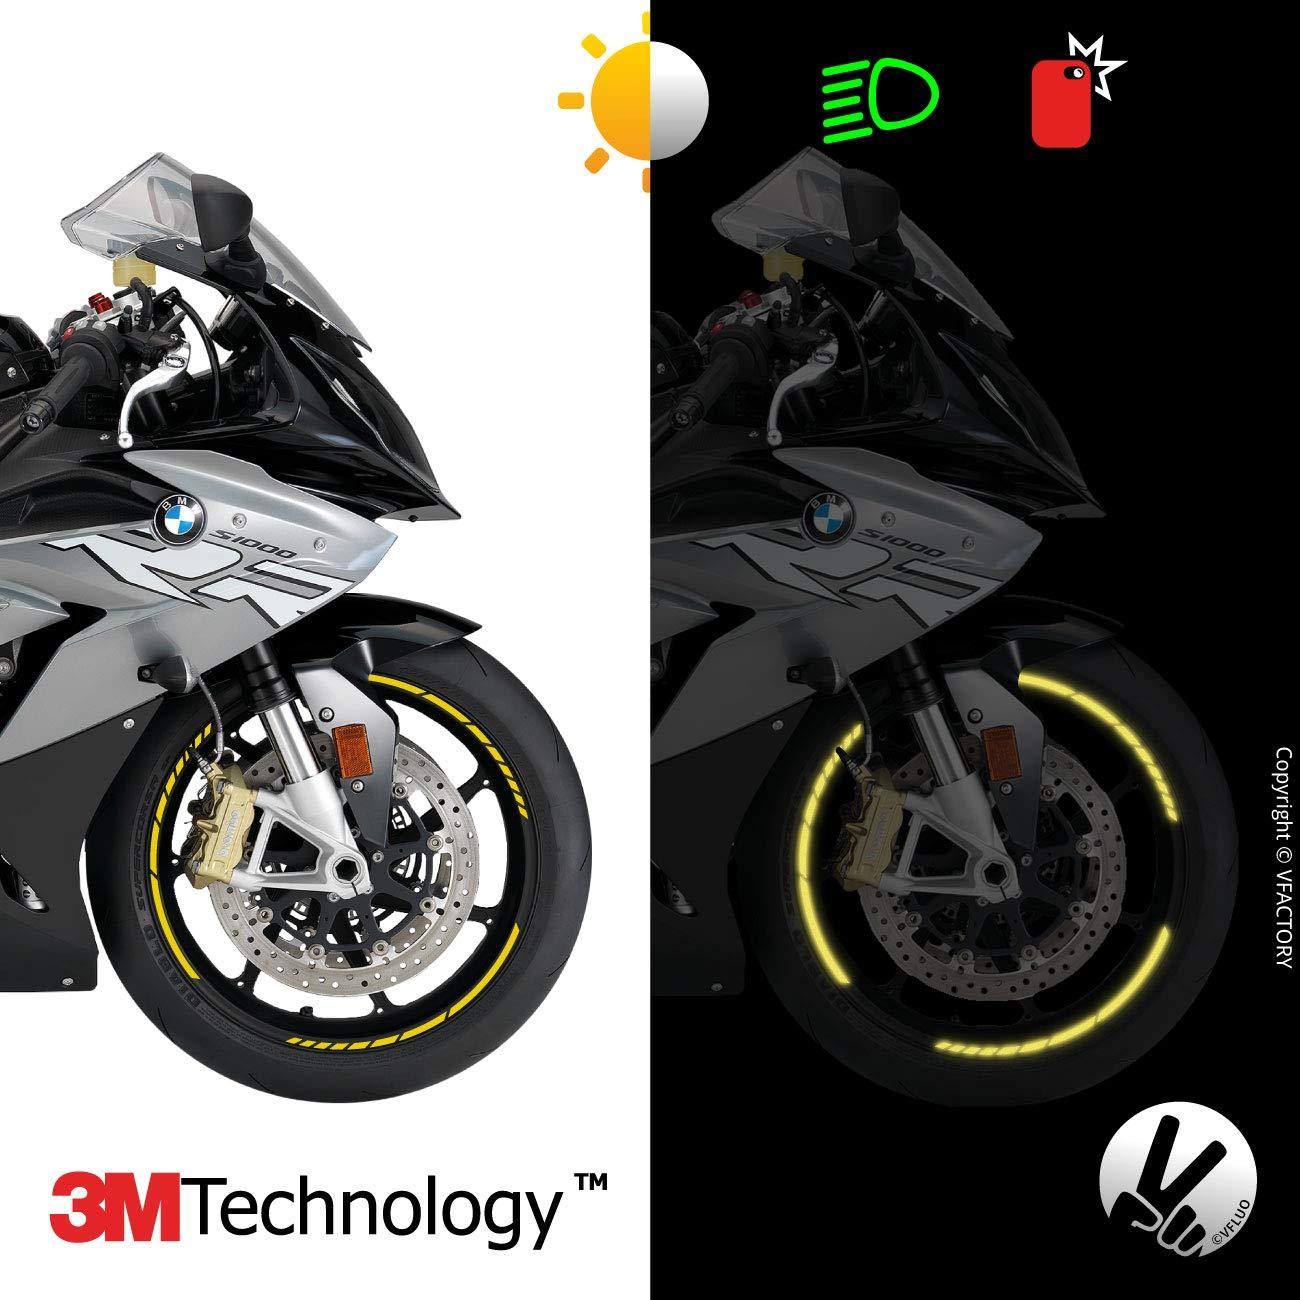 Rayas Retro Reflectantes para Llantas de Moto Anchura XL : 10 mm 3M Technology/™ Blanco//Plata Kit de Cintas 1 Rueda VFLUO GP Design/™